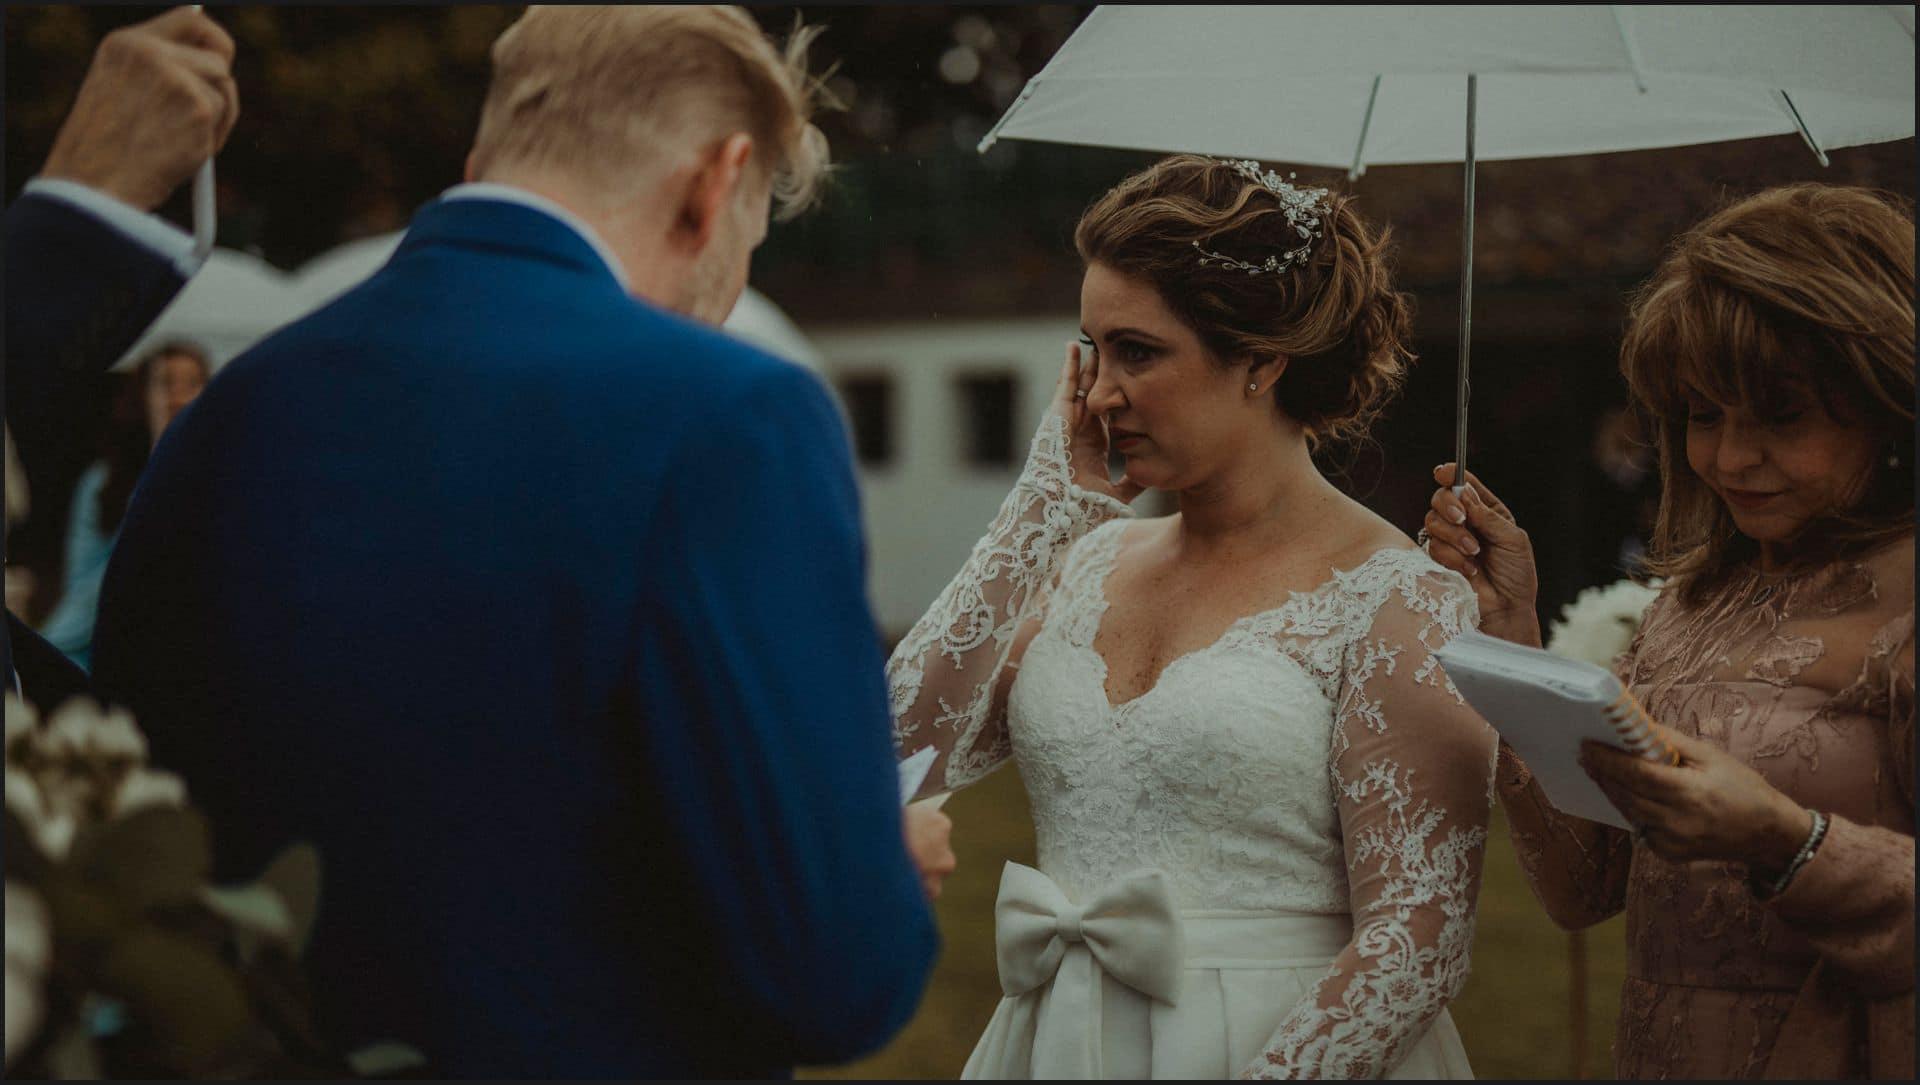 tuscany, destination wedding, chianti, wedding ceremony, bride, cry